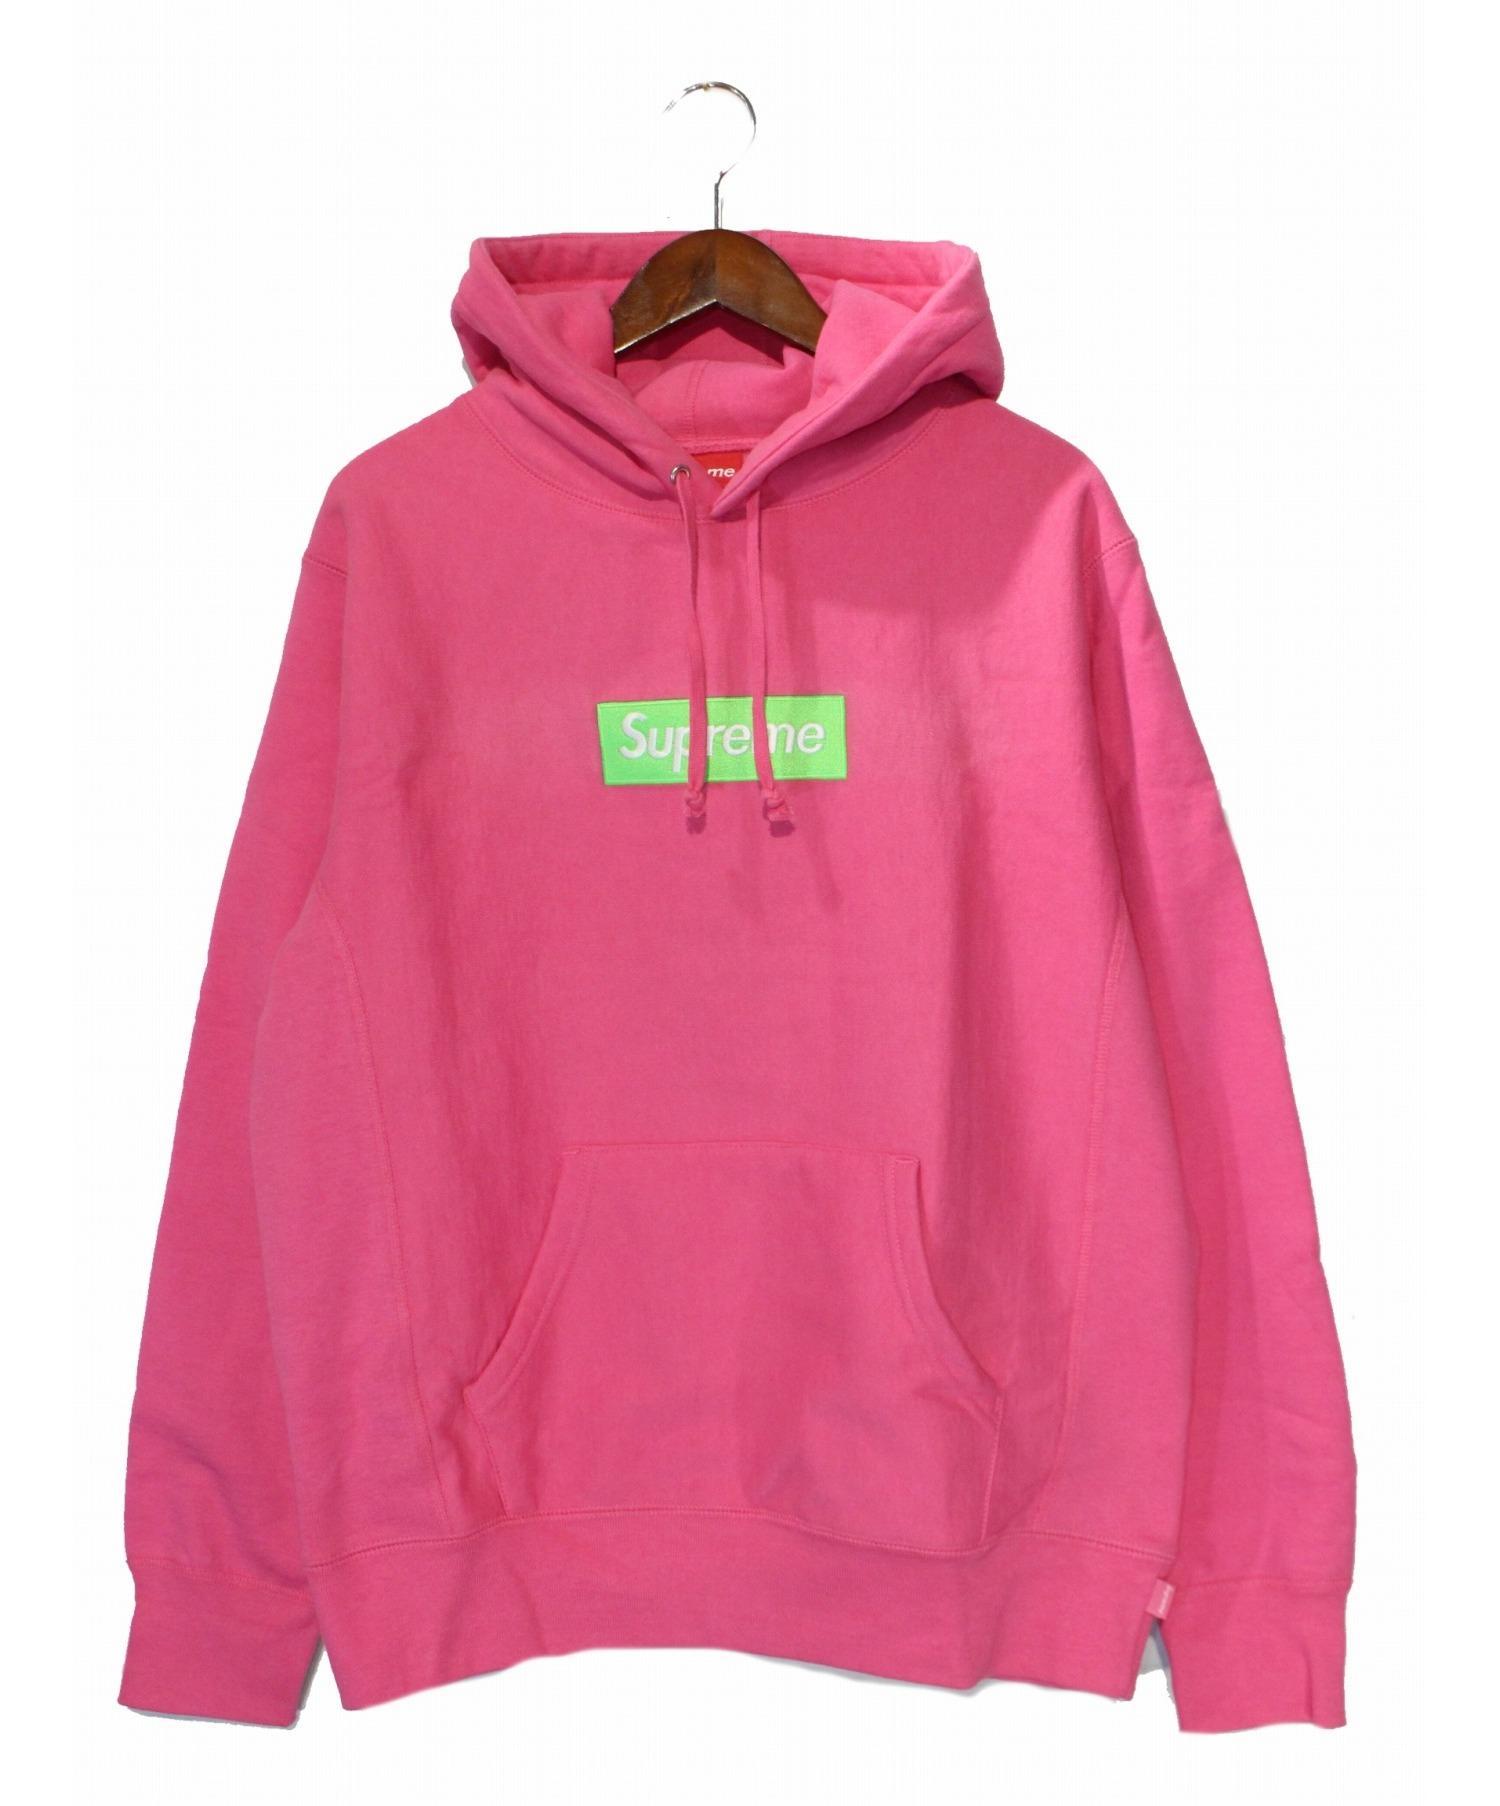 Hoodies & Sweatshirts Good Supreme Pink Hooded Sweatshirt Hoodie Size Large Activewear